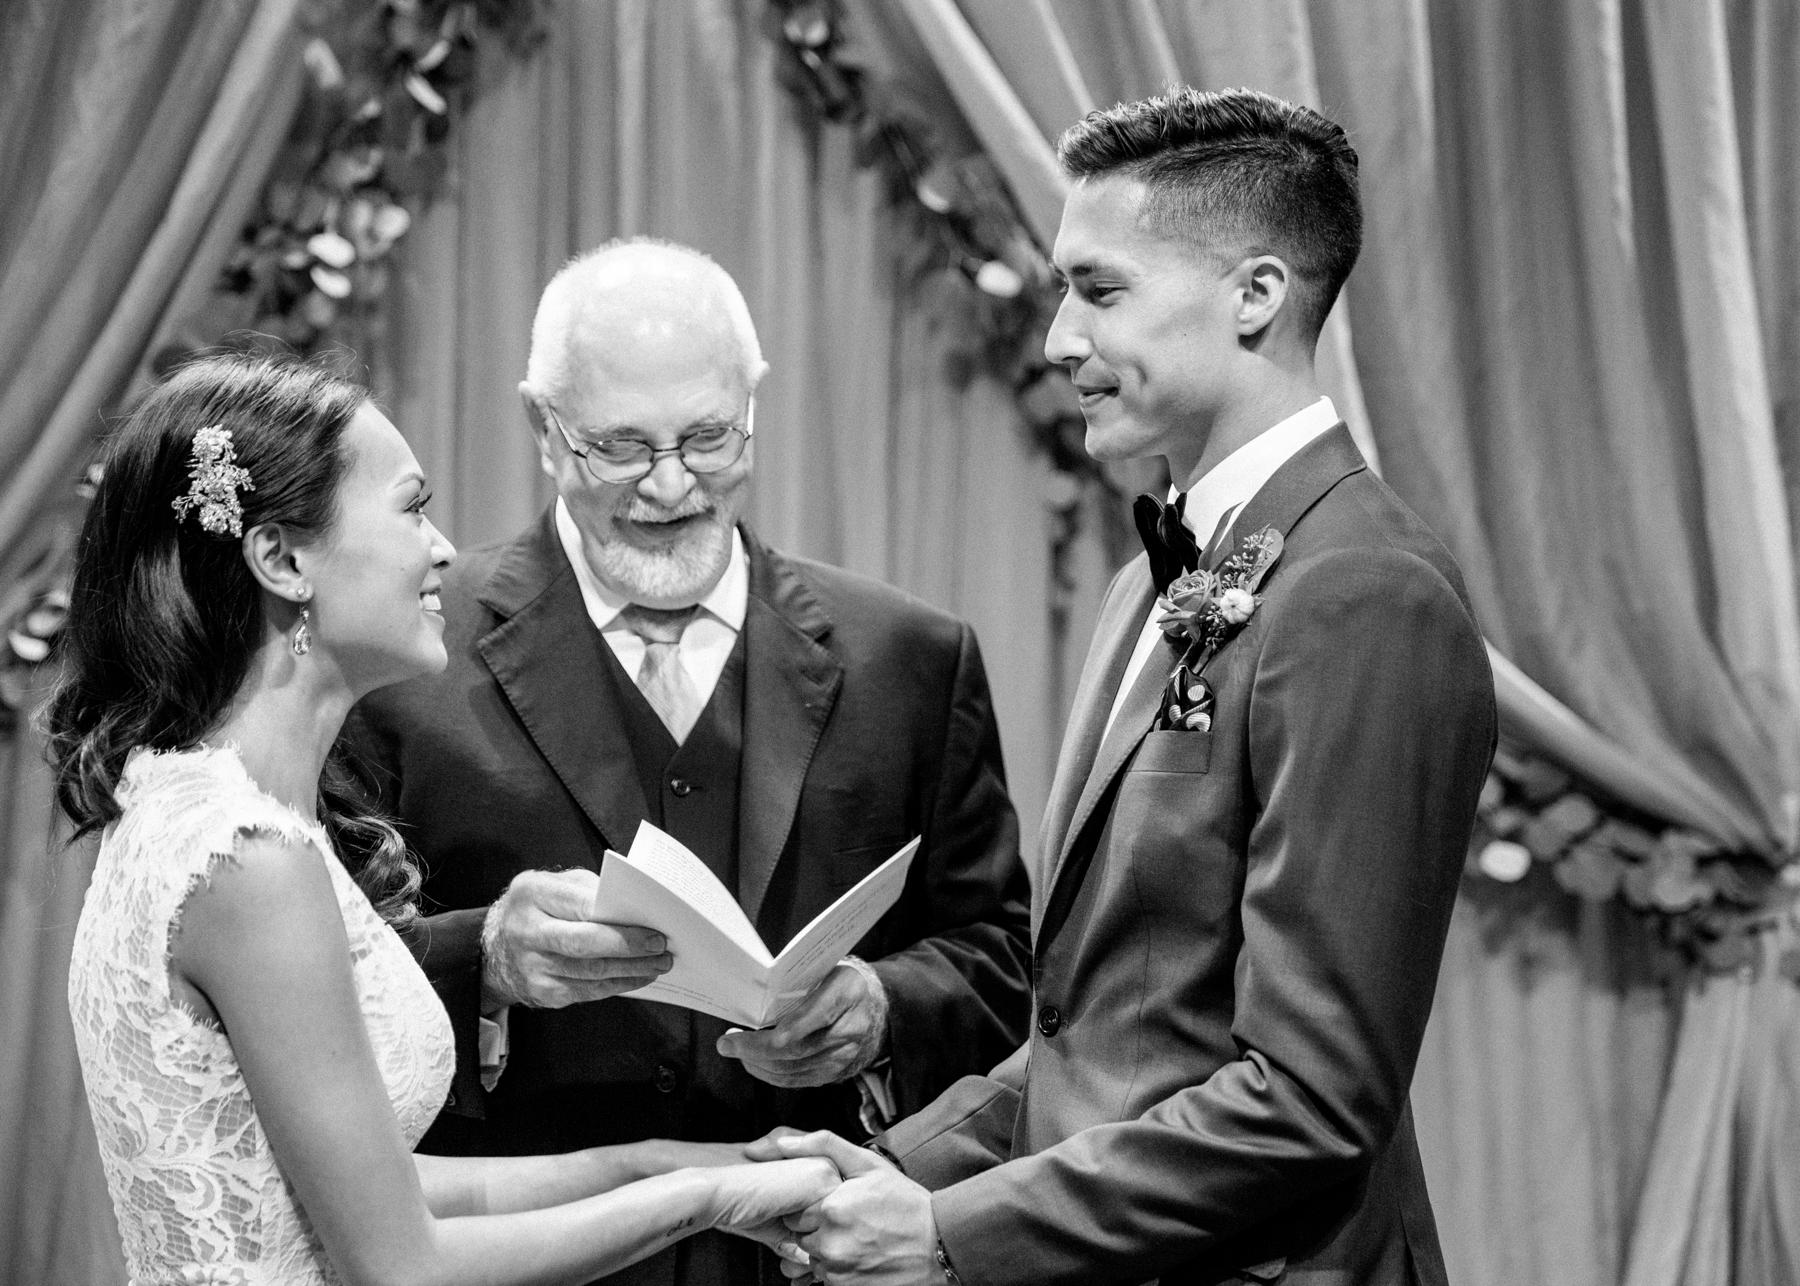 kaoverii_silva_photographer_via-herafilms_kieu_kaz_wedding-12.jpg